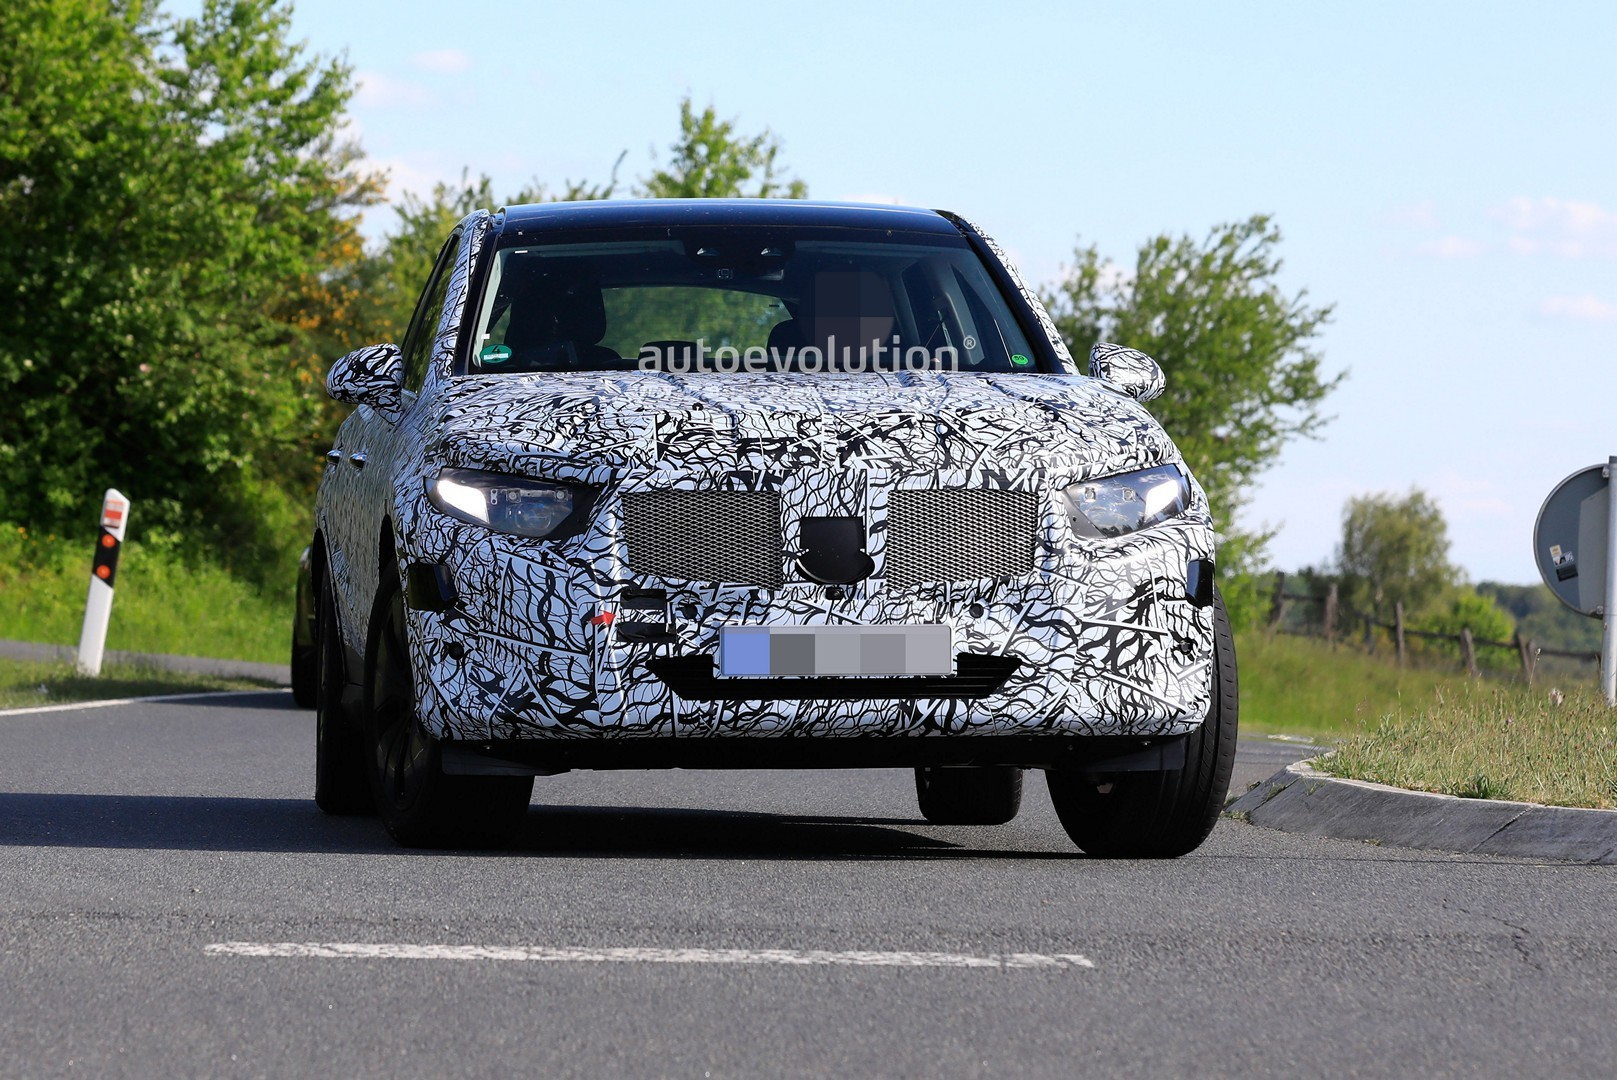 2021 - [Mercedes-Benz] GLC II 2022-mercedes-benz-glc-class-spied-up-close-looks-bigger_4